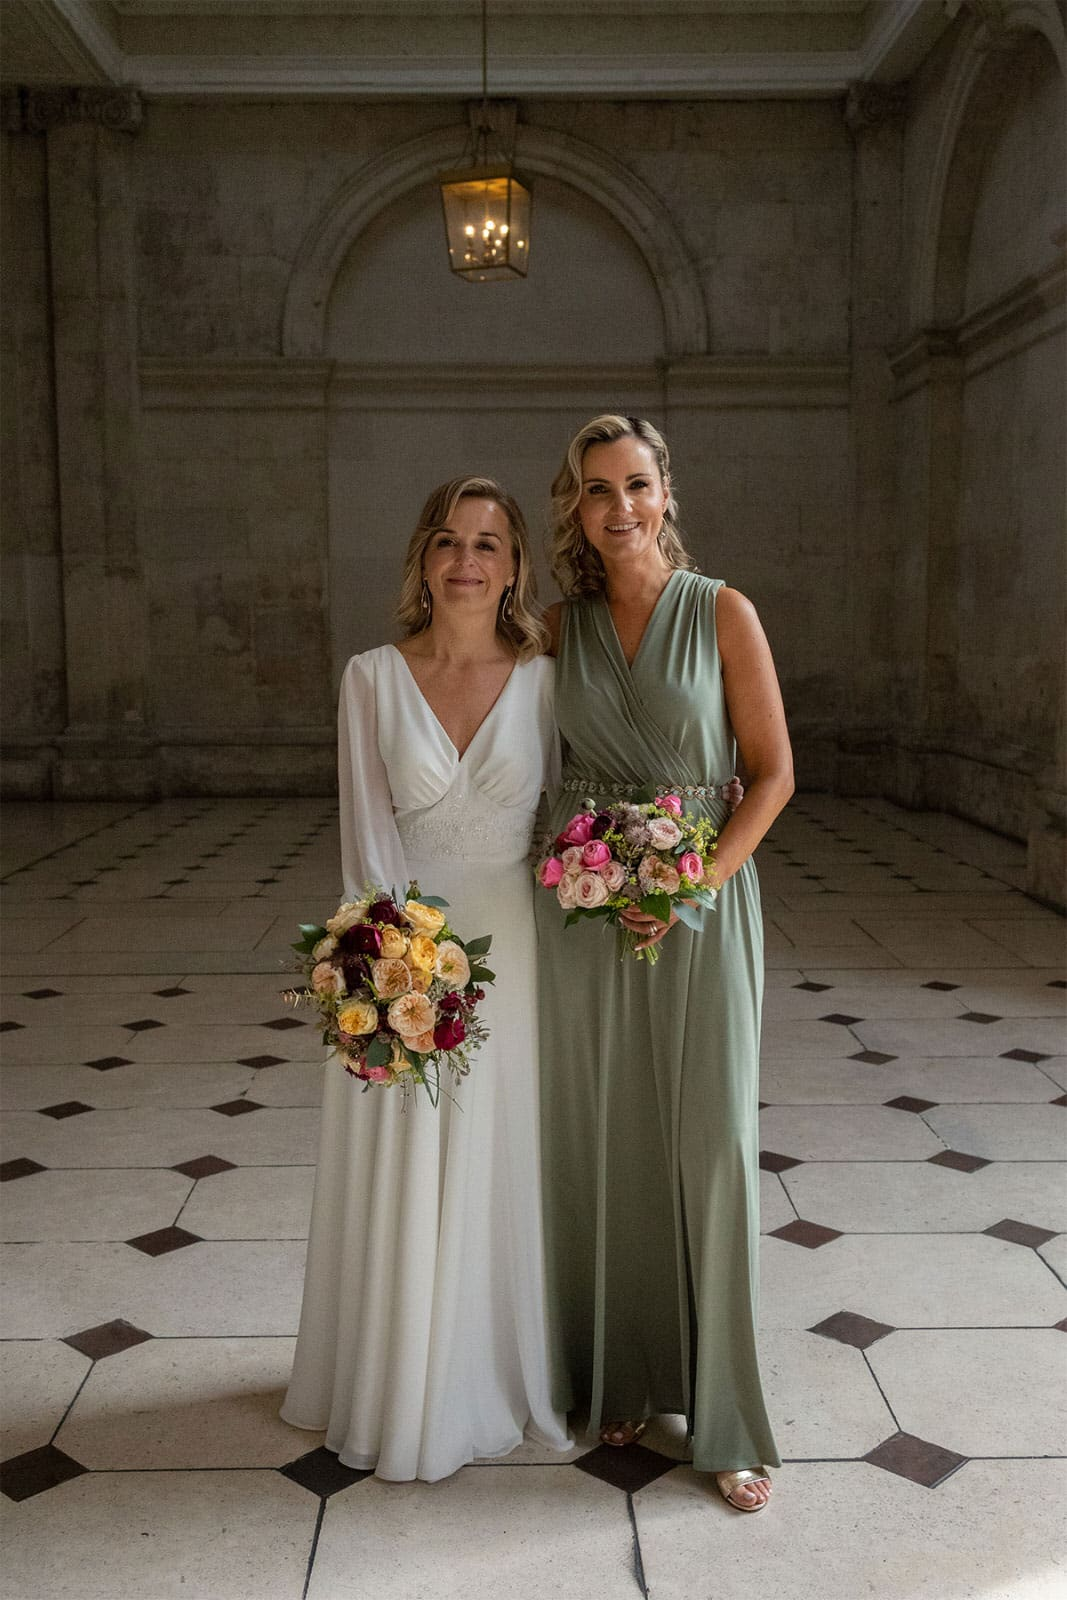 bridal party photos Dublin City Hall Shelbourne Hotel Wedding